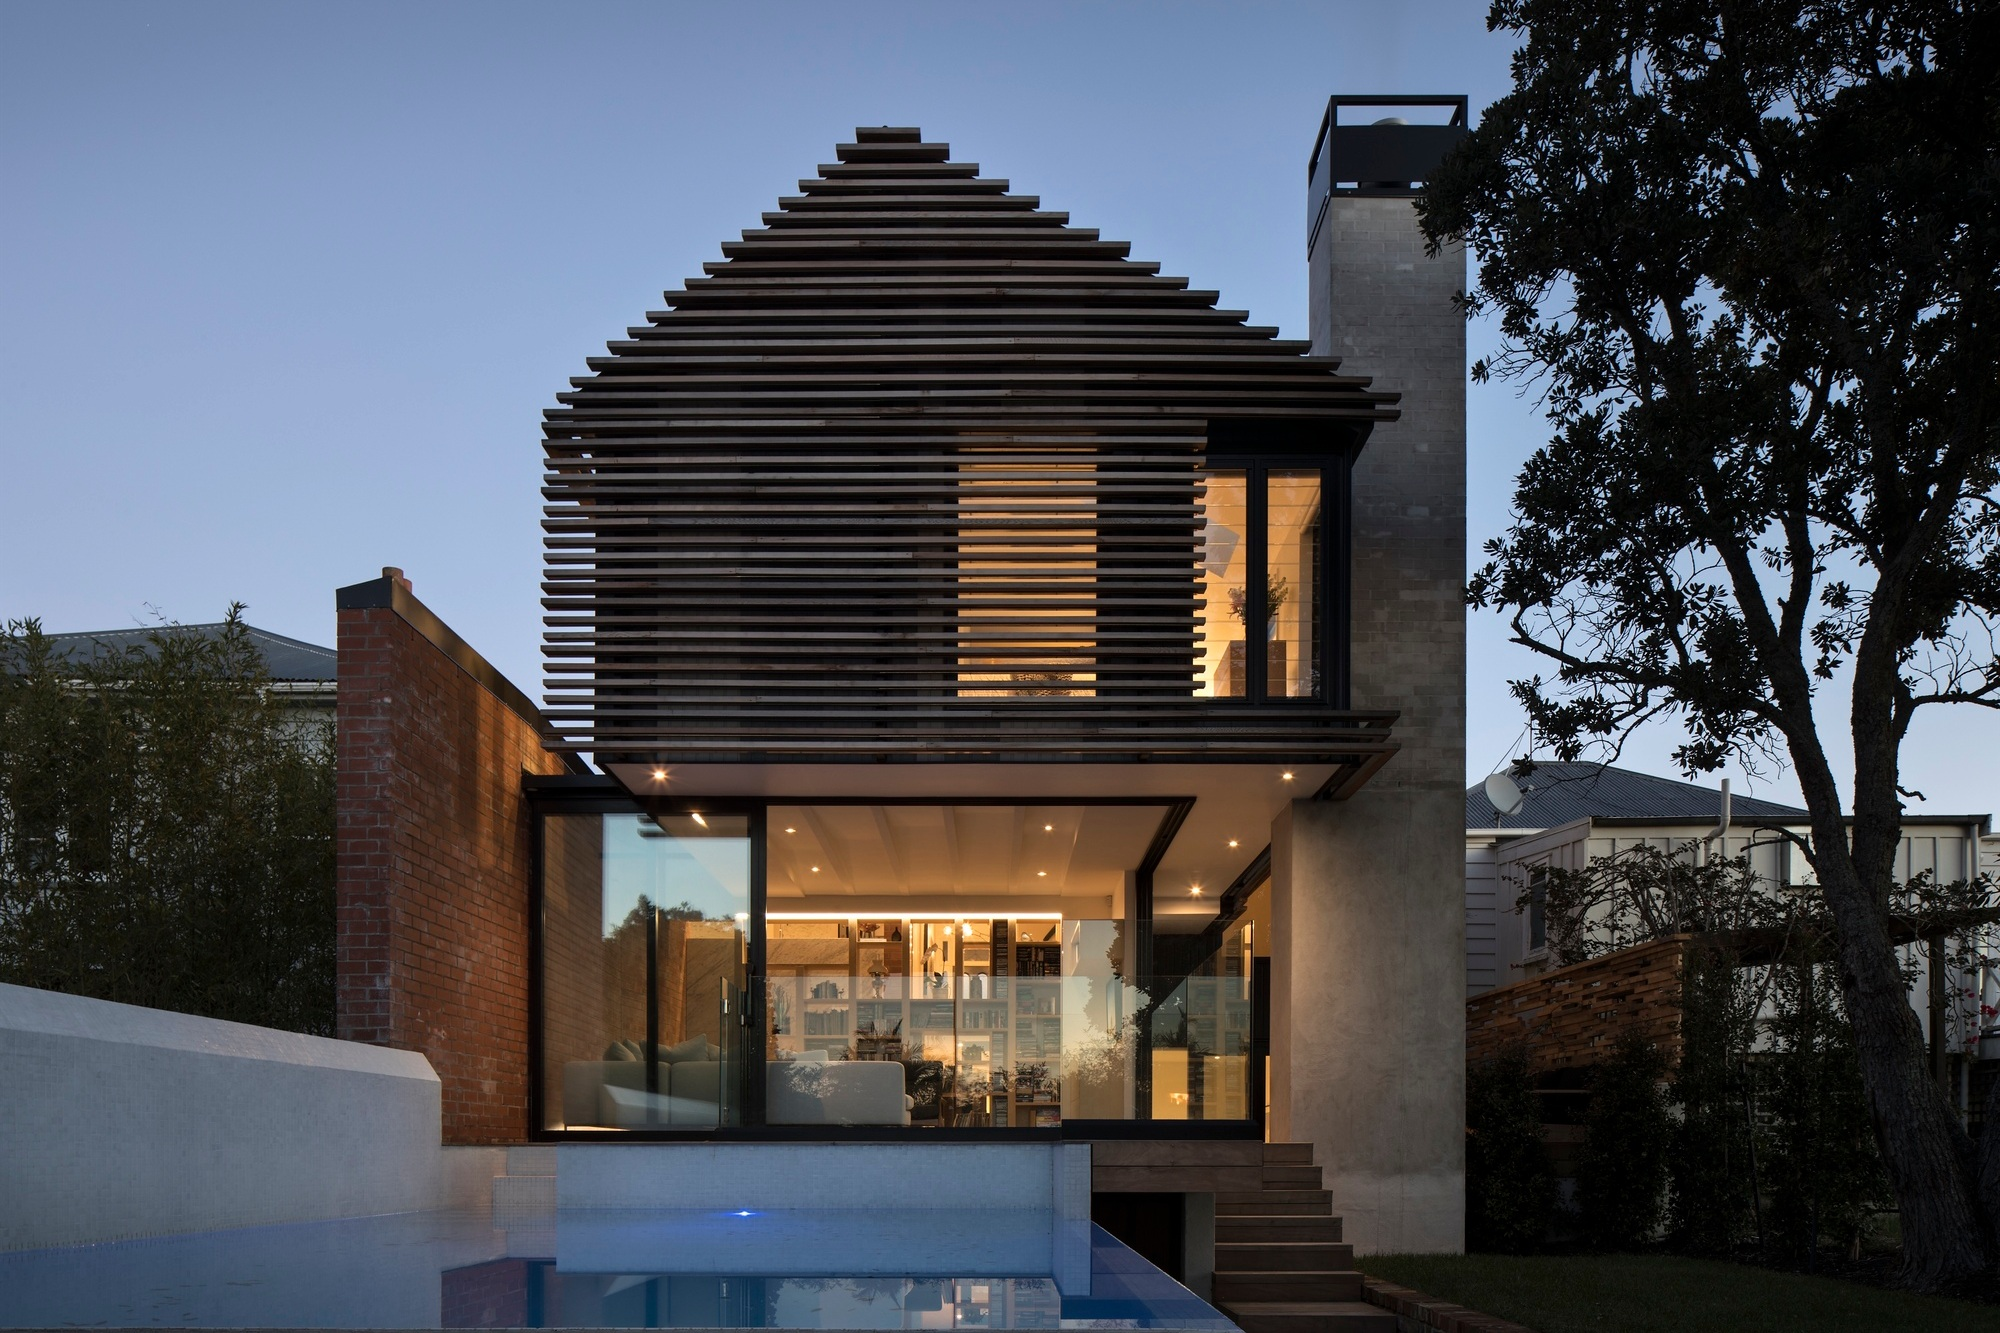 house+outdoor.jpg